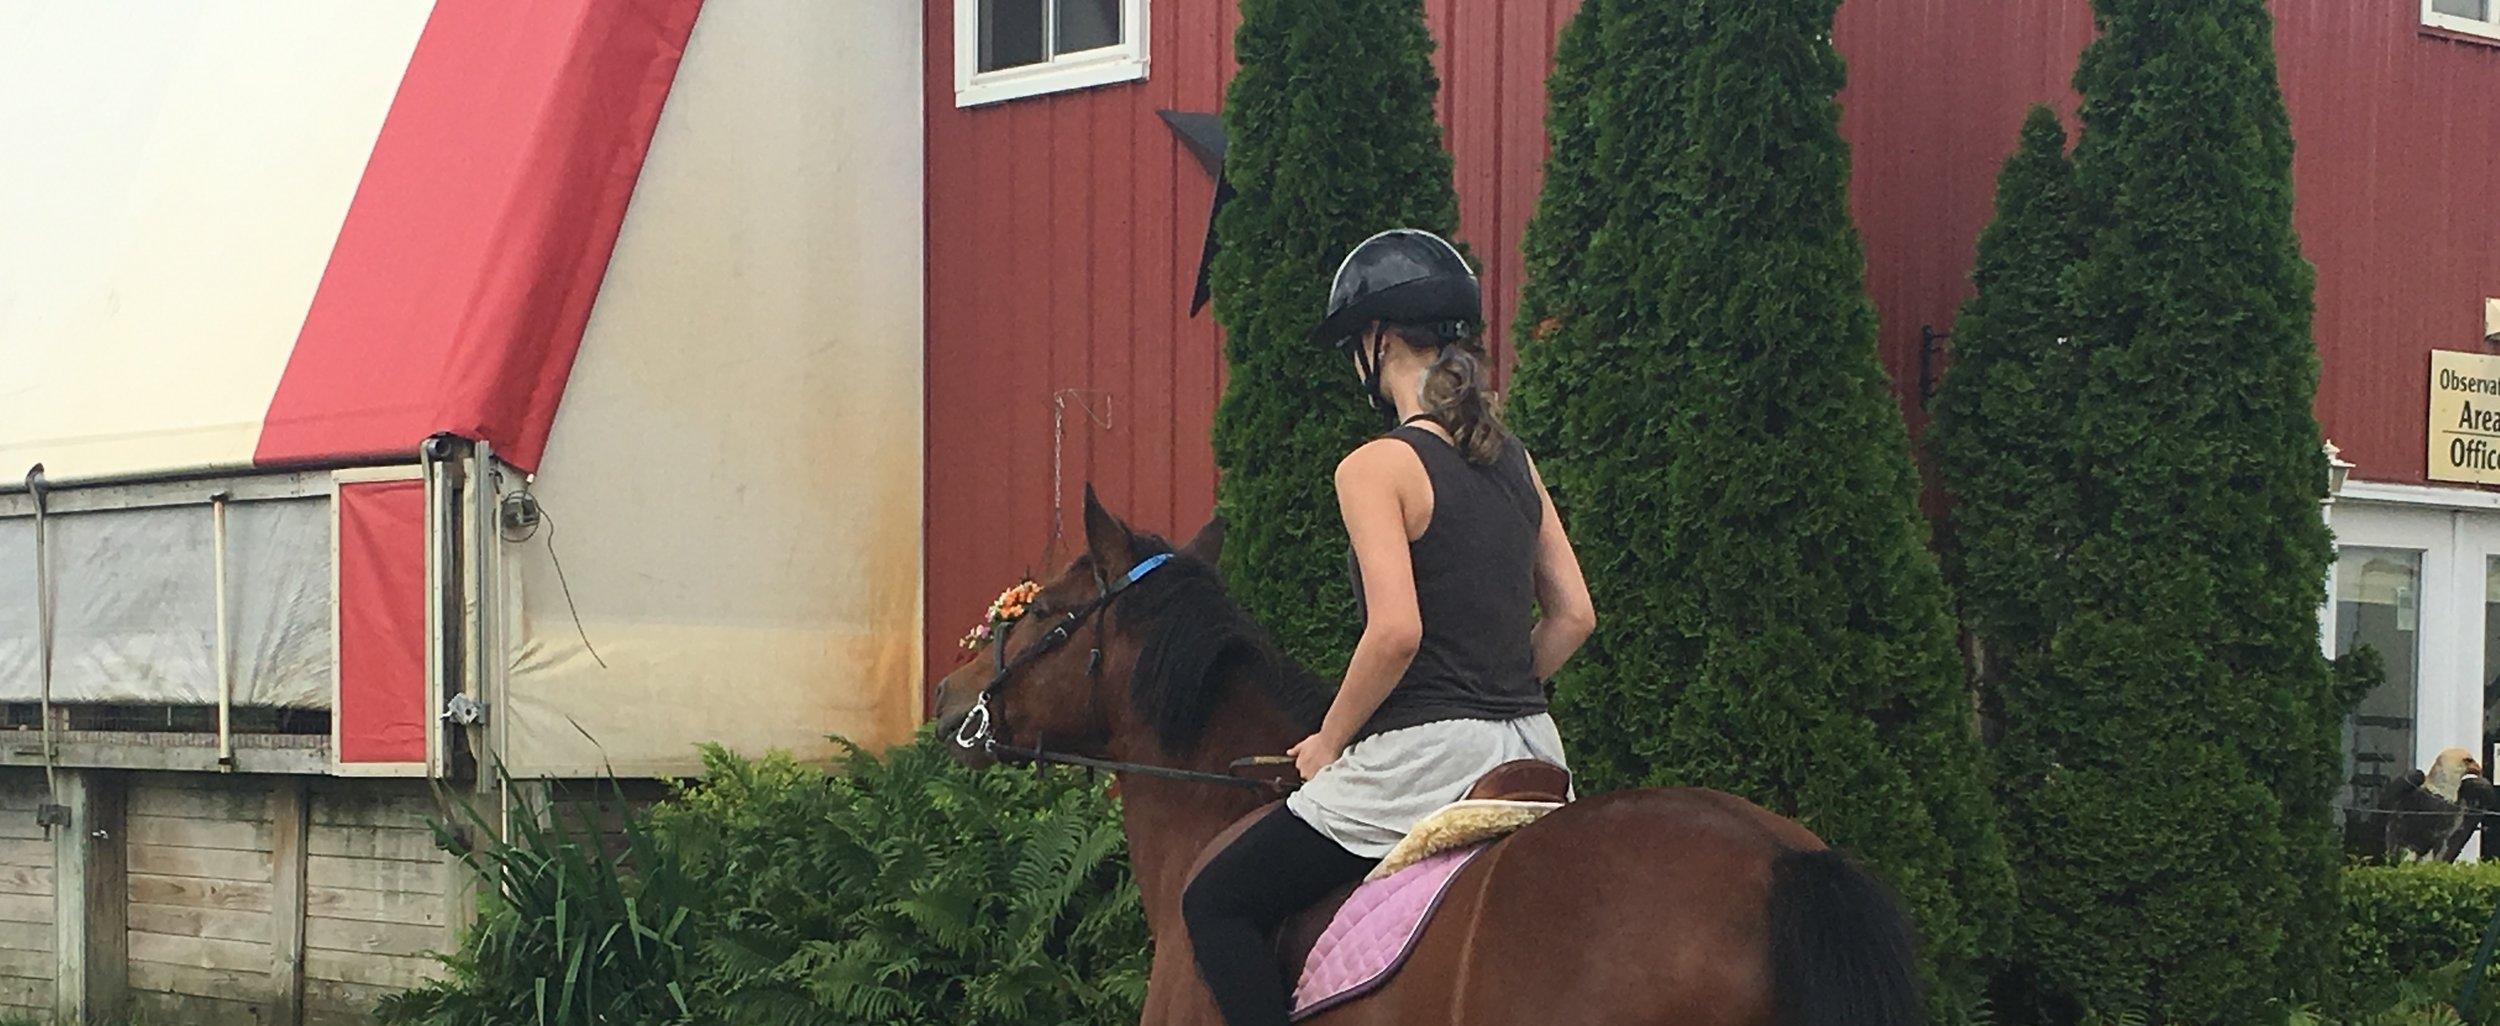 LESSONS - HORSEBACK RIDING AT CEDAR RIDGE